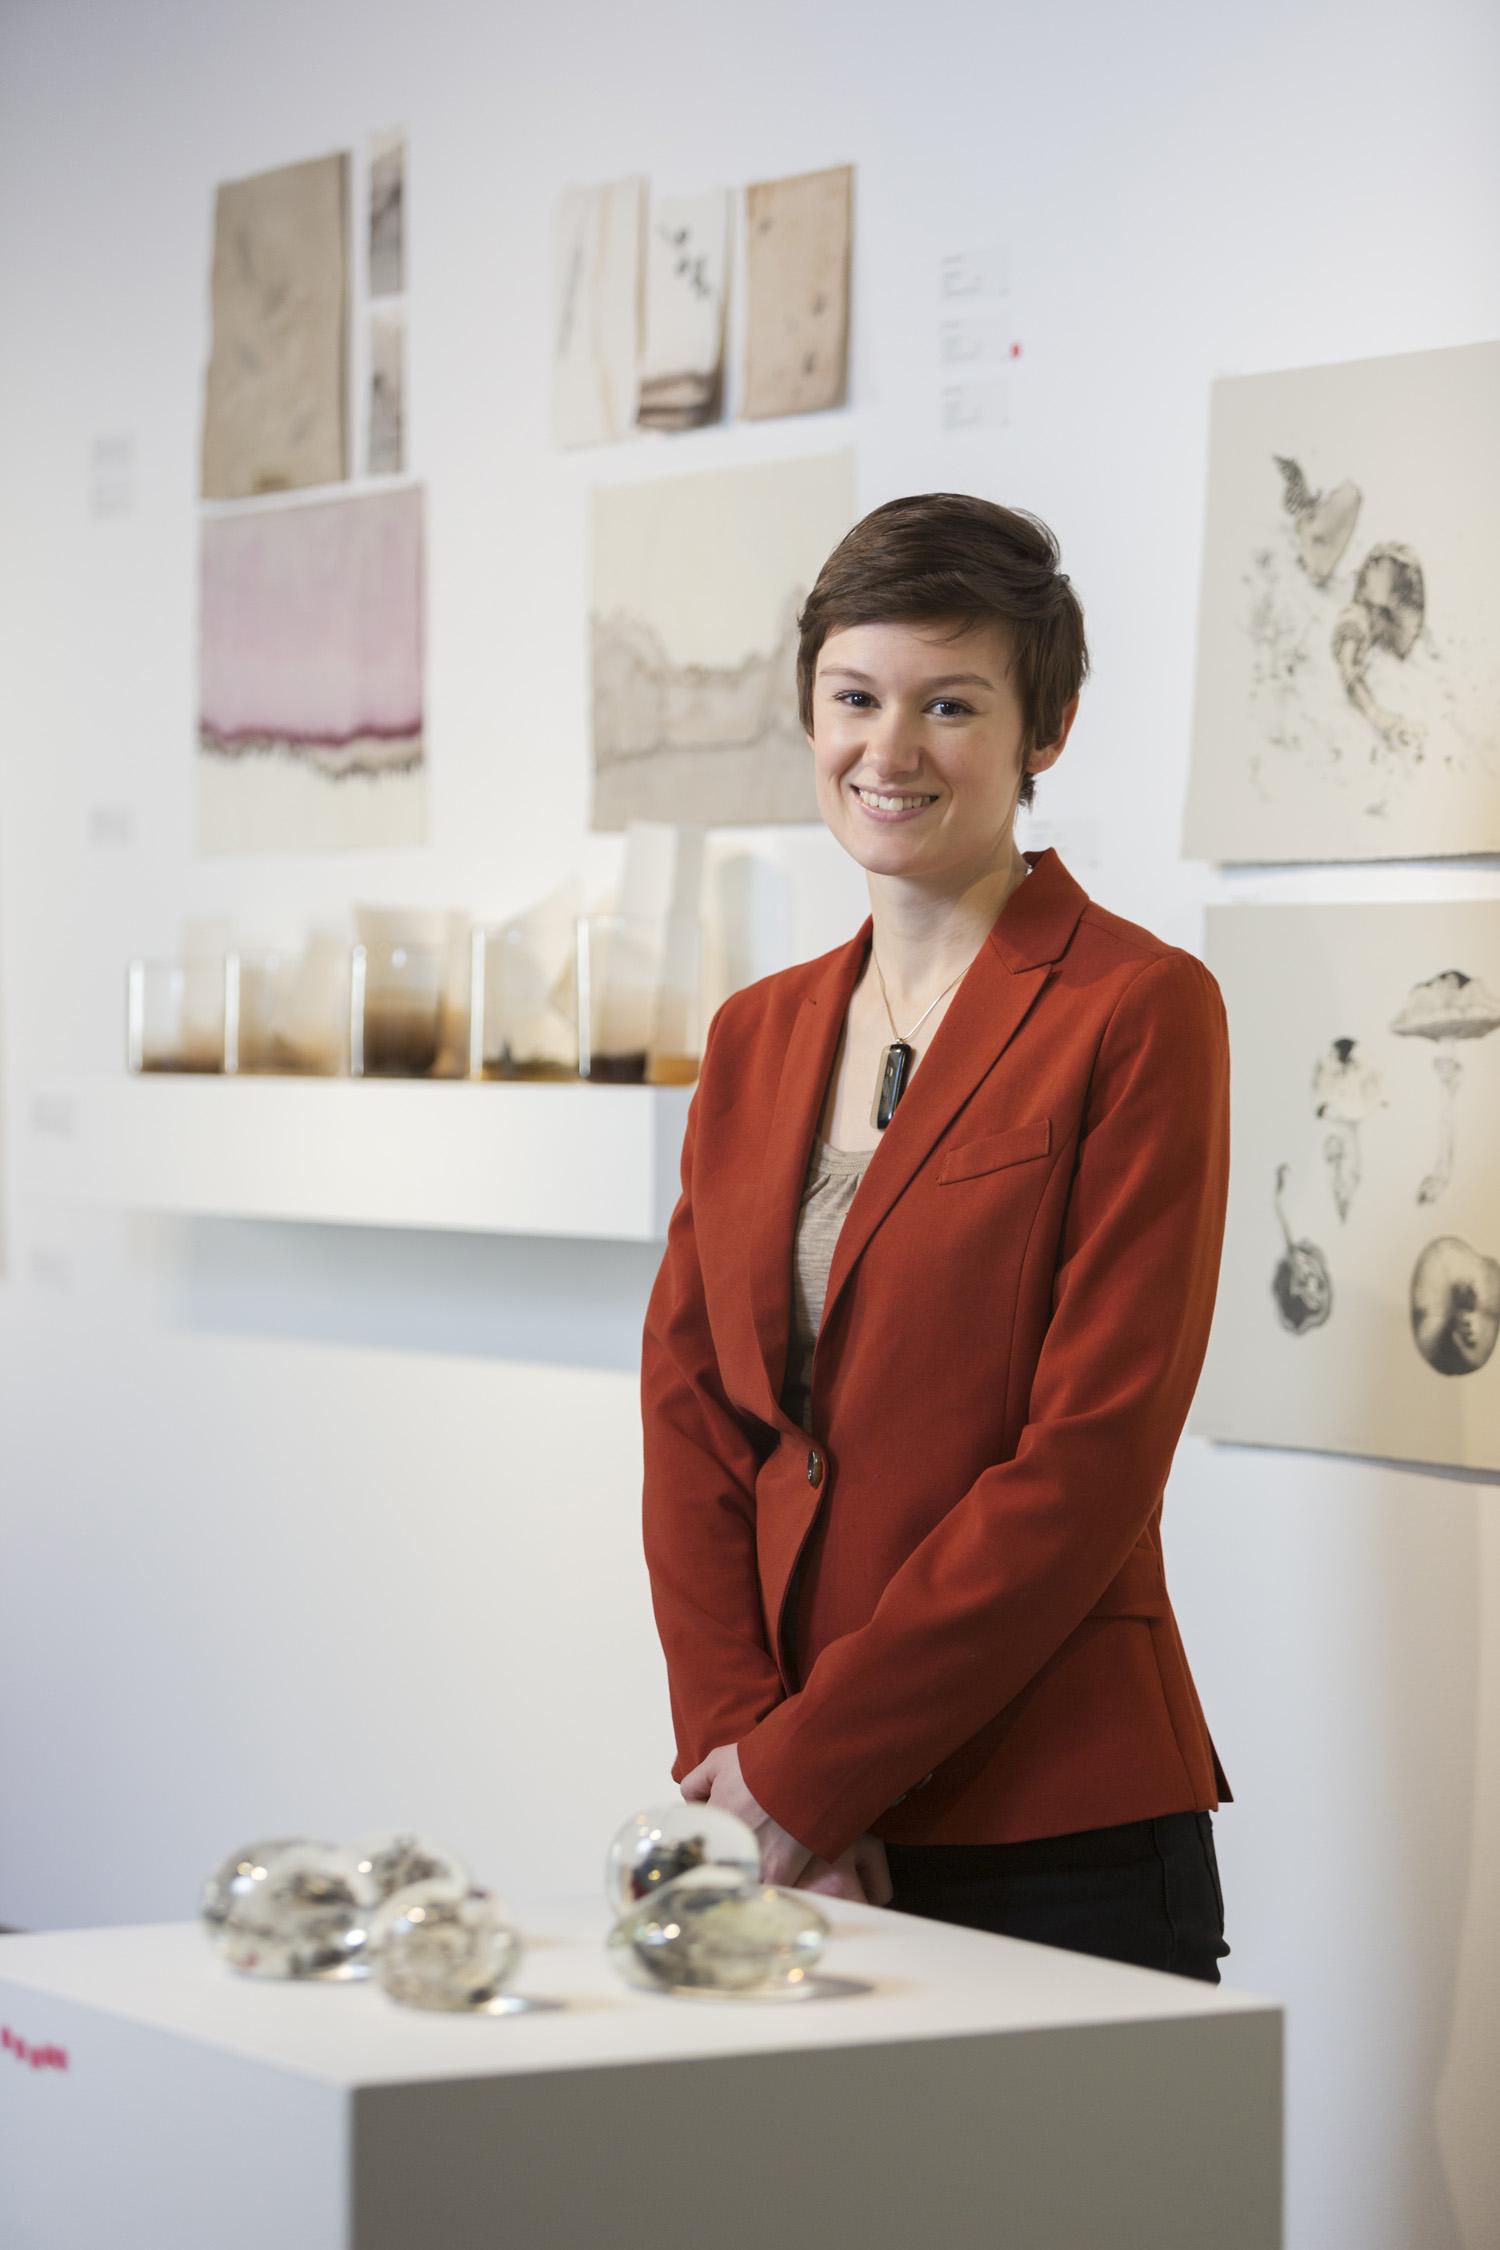 Emilie Patteson, 2014 (photo by Adam McGrath), Canberra Glassworks GLINT exhibition install